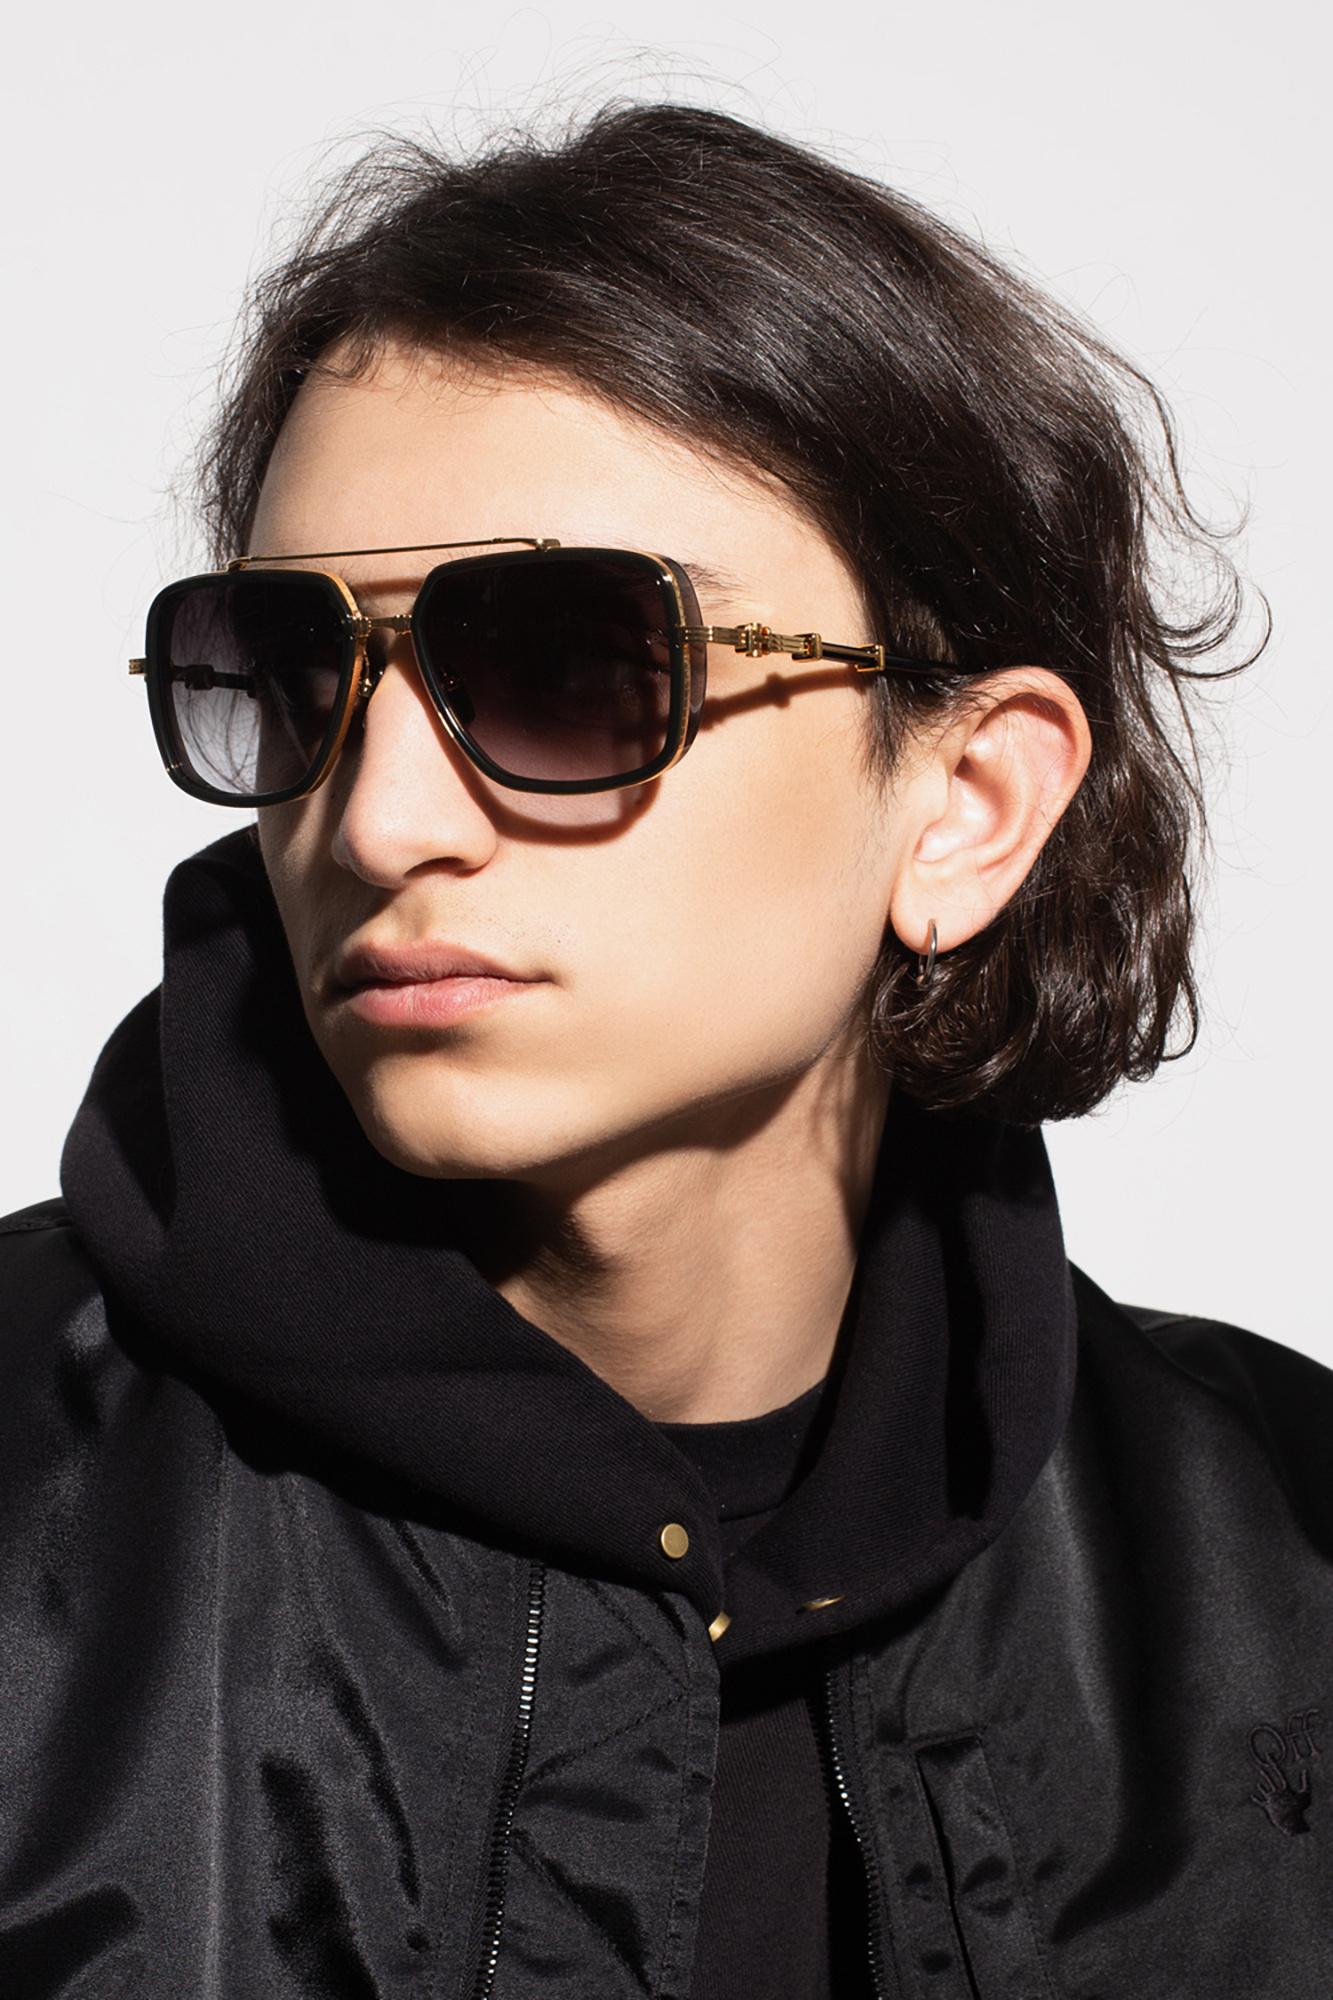 Balmain 'Officier' sunglasses